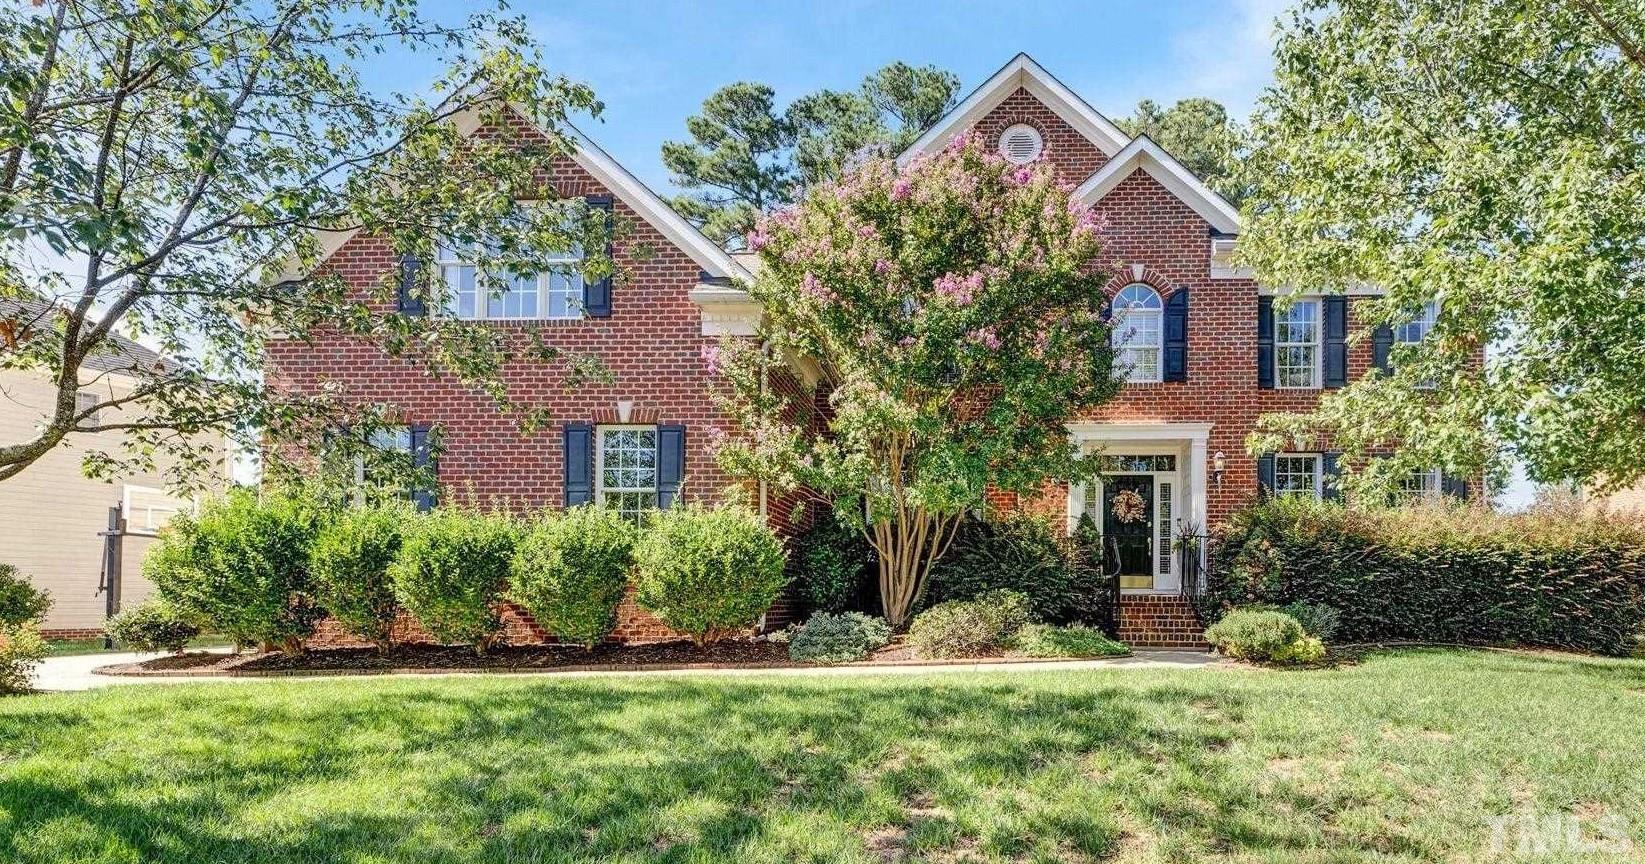 Photo of 10716 Round Brook Circle, Raleigh, NC 27617 (MLS # 2409905)